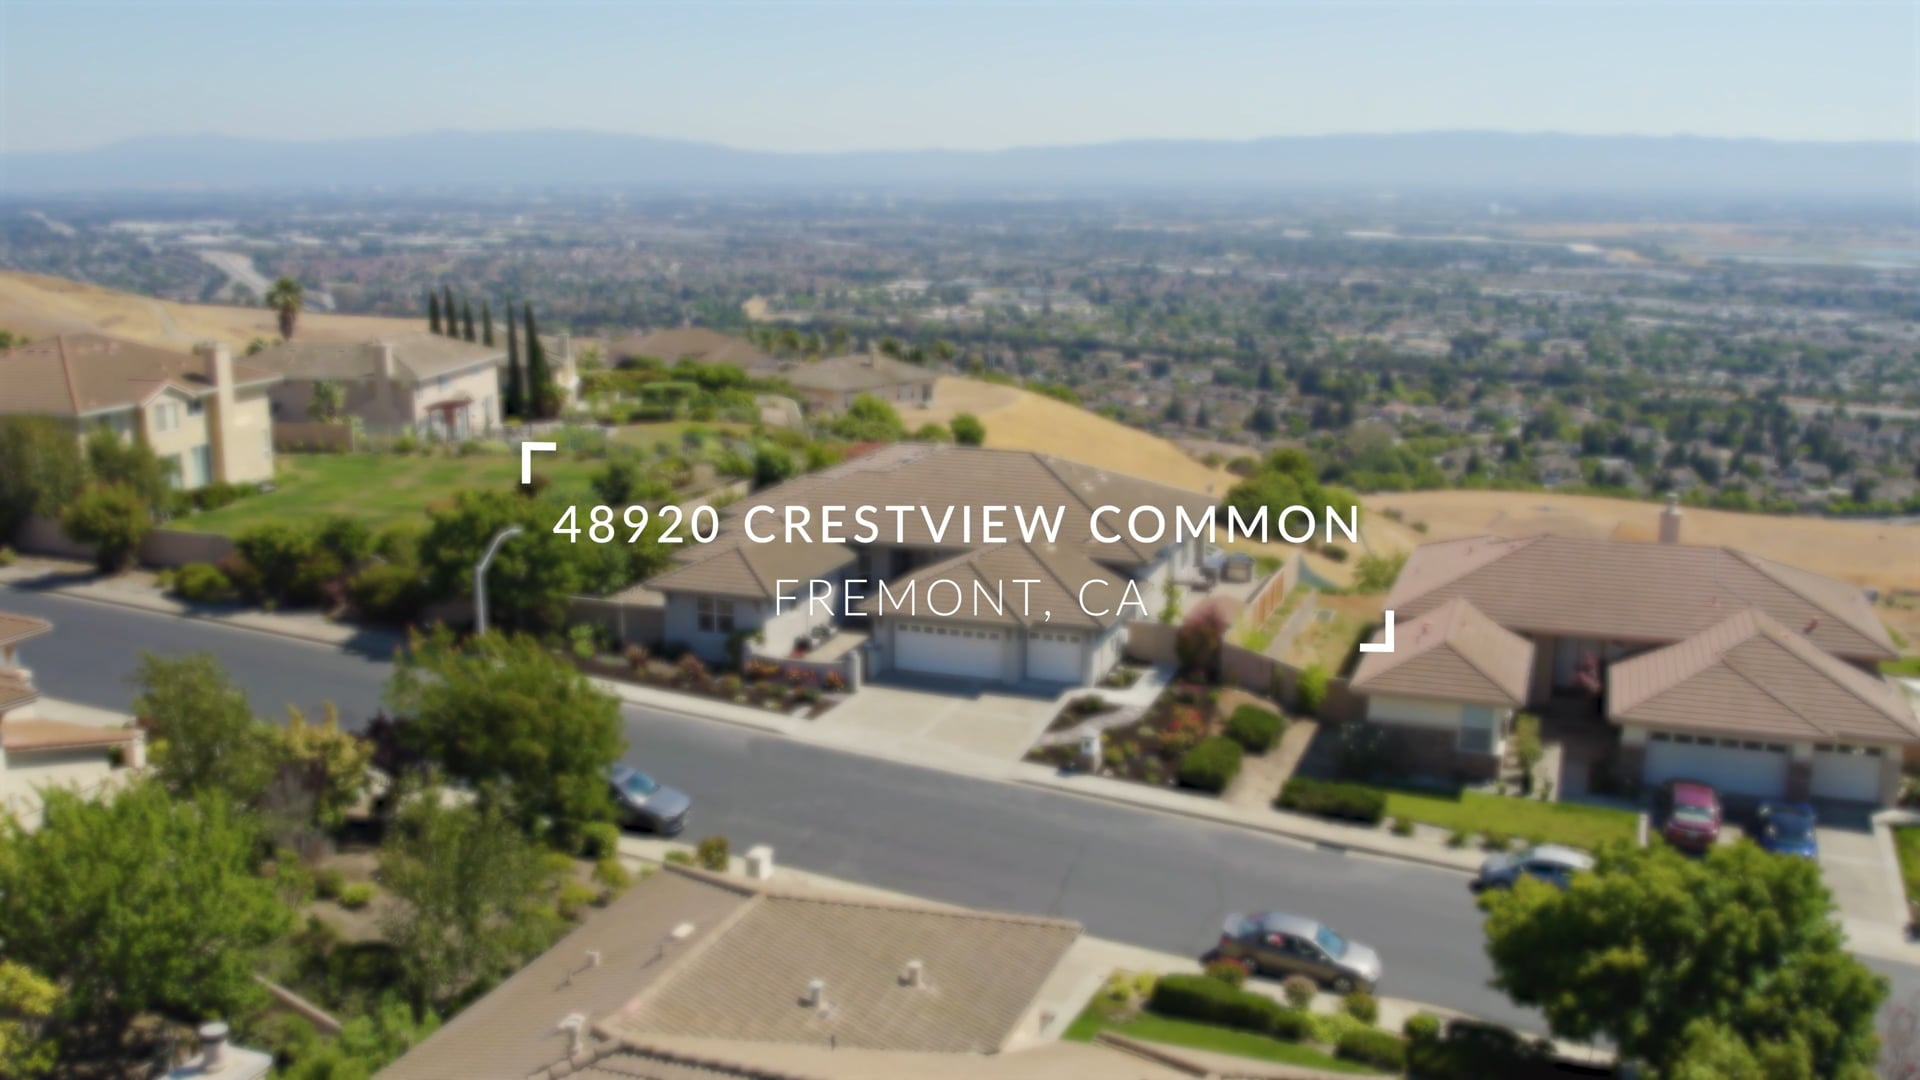 48920 Crestview Common, Fremont, Ca   Joseph Sabeh Jr   Venture Sotheby's International Realty